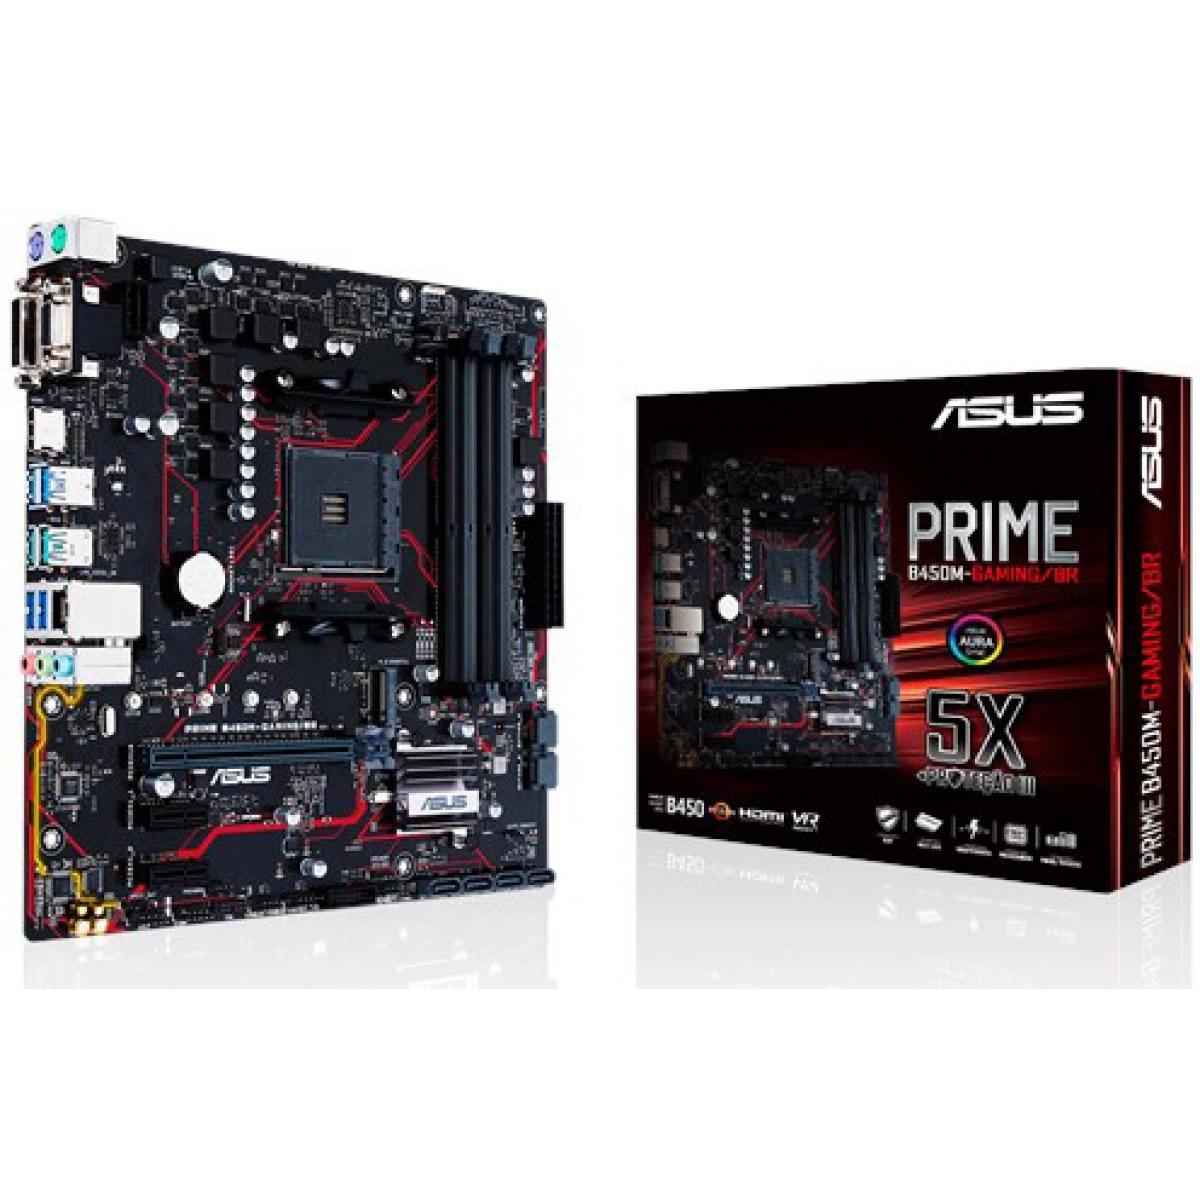 Placa mãe Asus Prime B450m Gaming/br Amd Am4 Ddr4 Ryzen